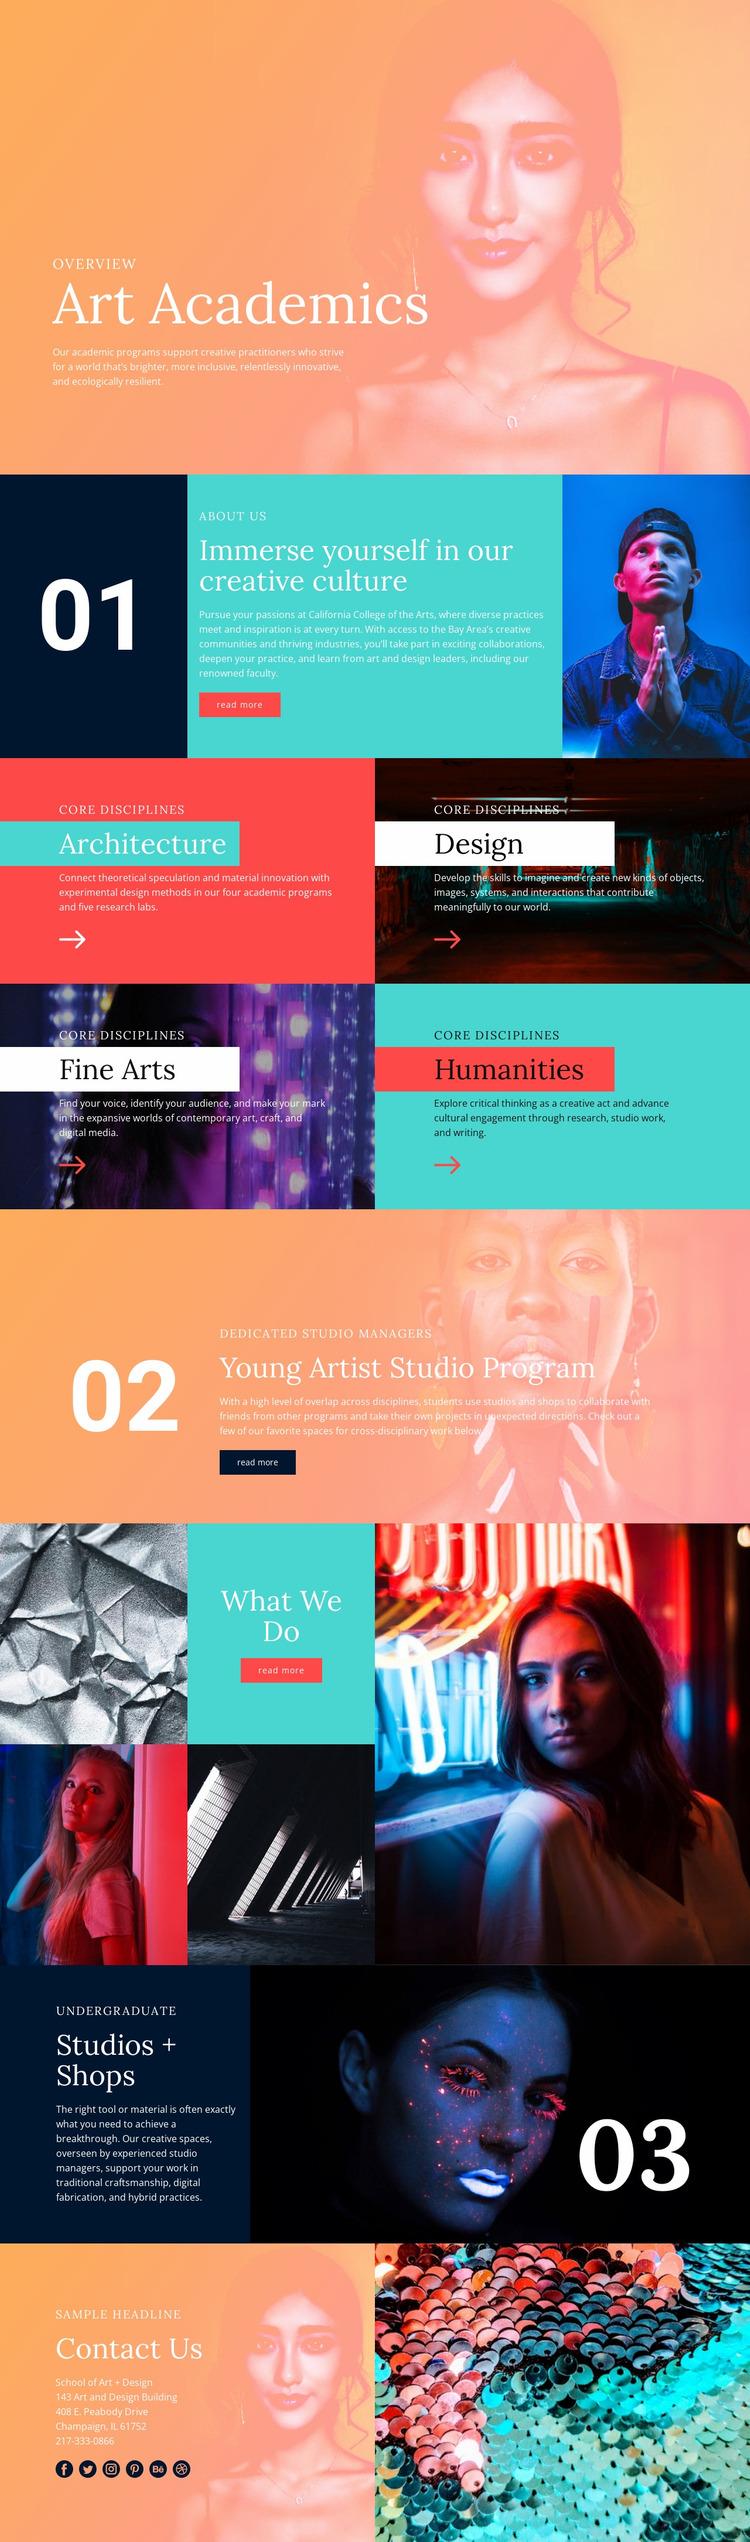 Creative culture in school Website Mockup